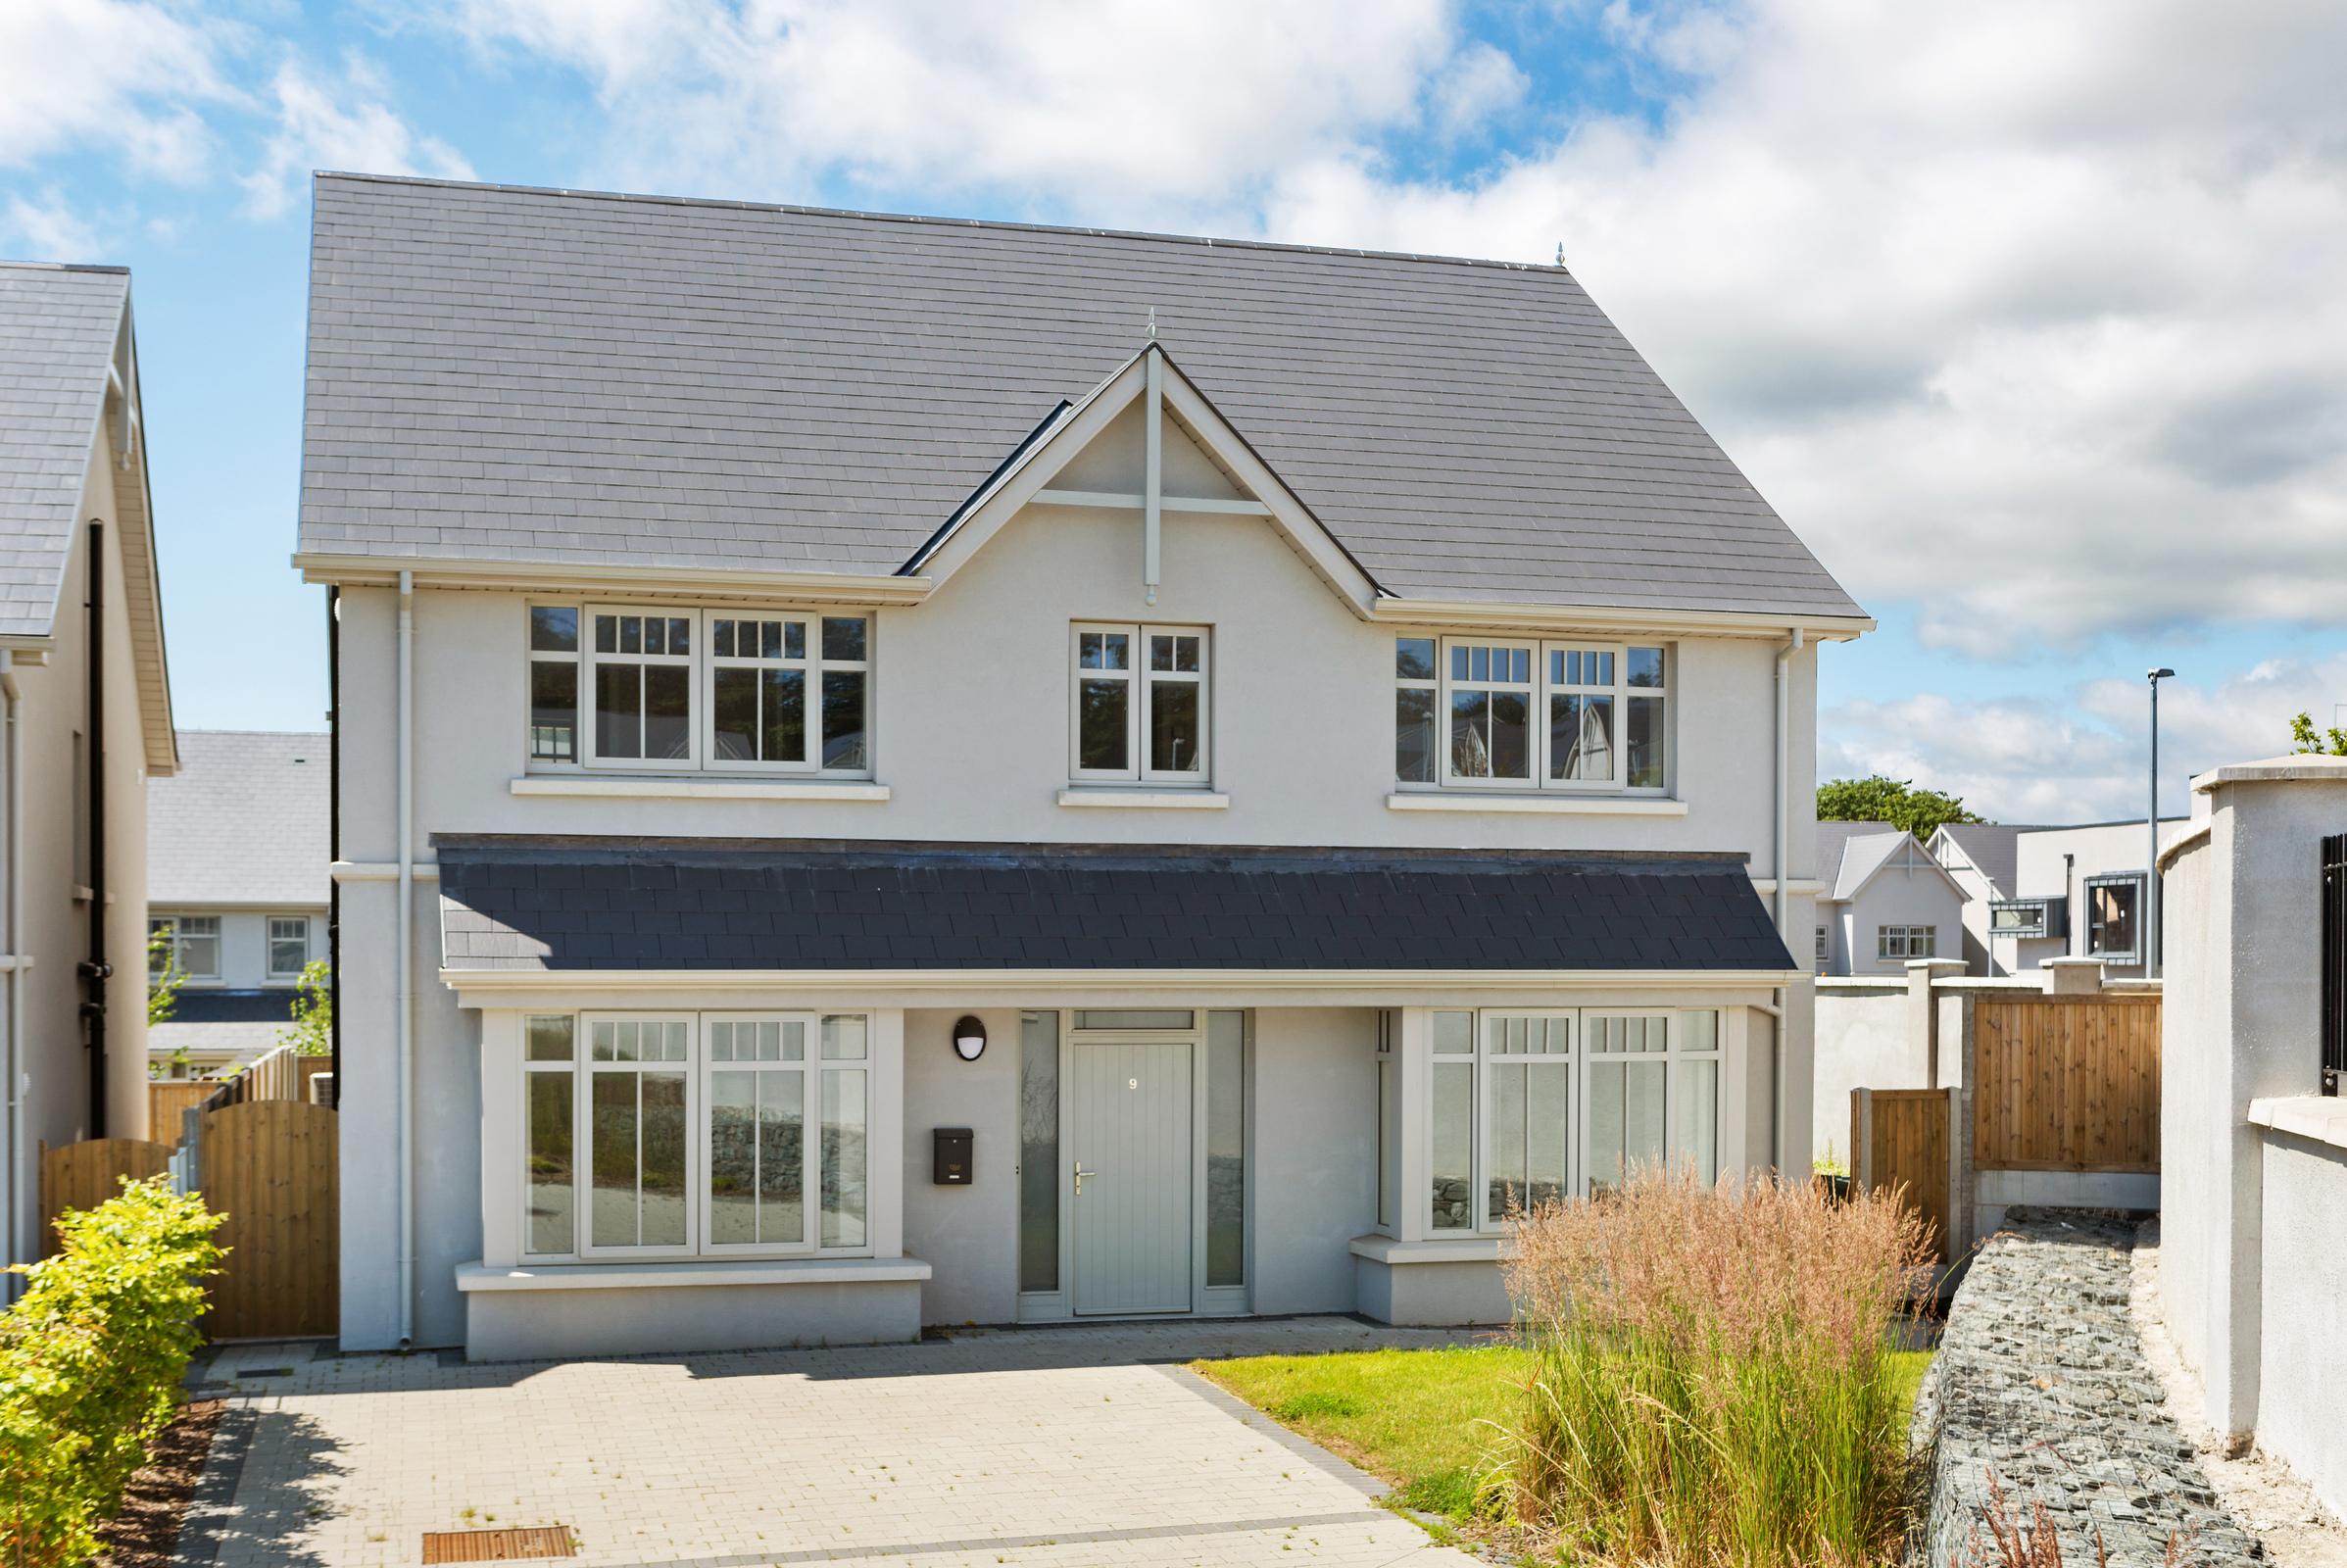 5 Bed Detached House, Ballinahinch Wood, Ashford, Co. Wicklow